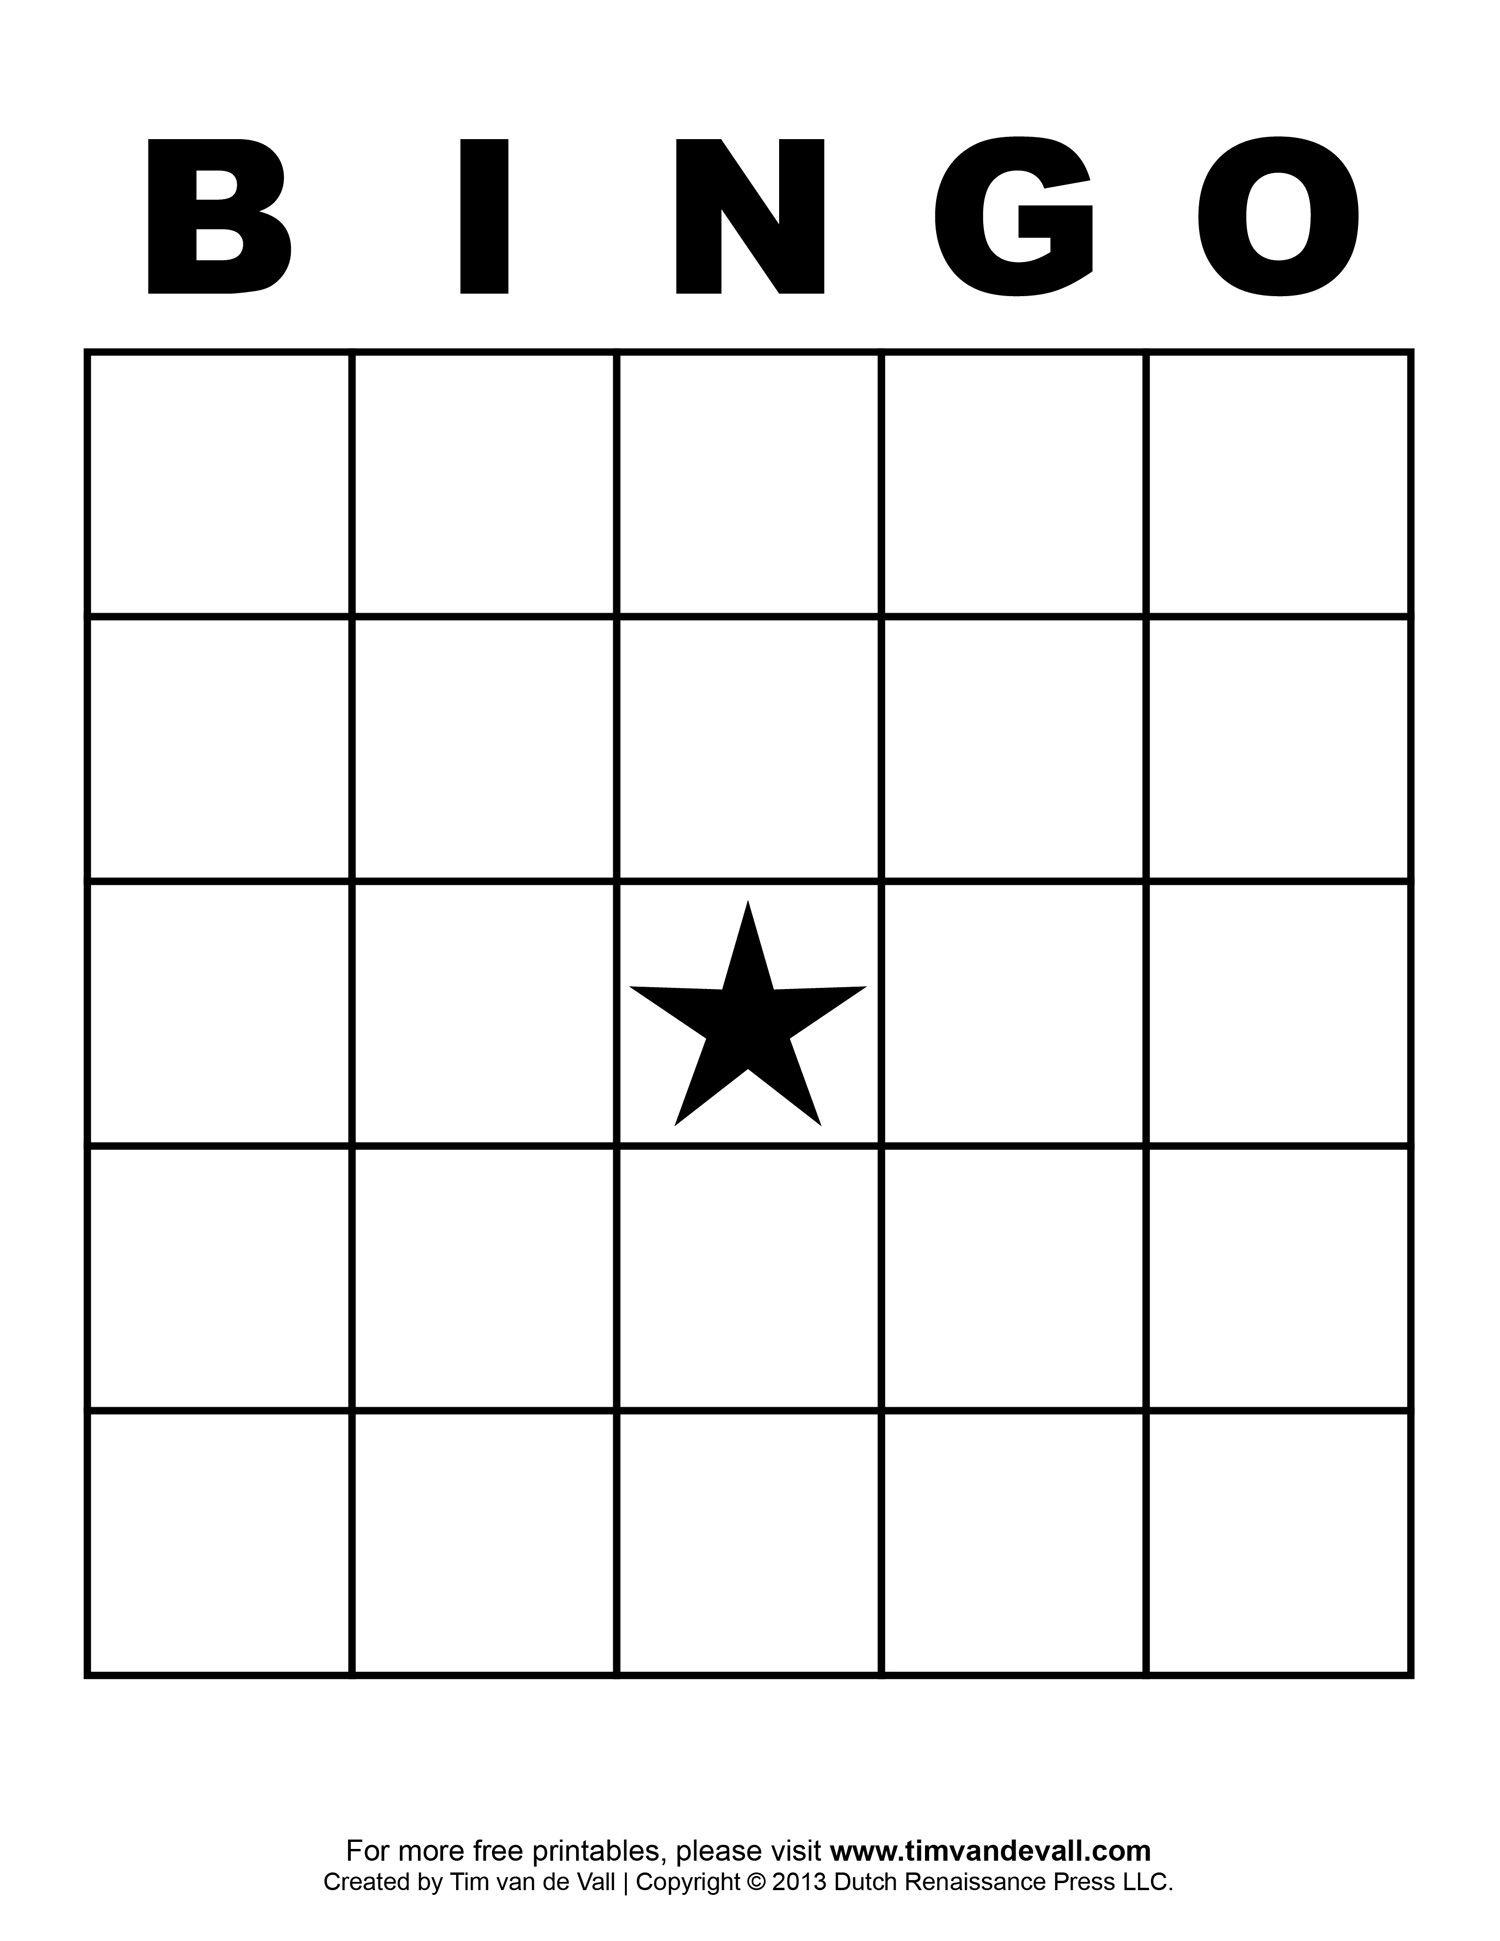 Free Printable Blank Bingo Cards Template 4 X 4 | Classroom | Blank - Free Printable Bingo Cards